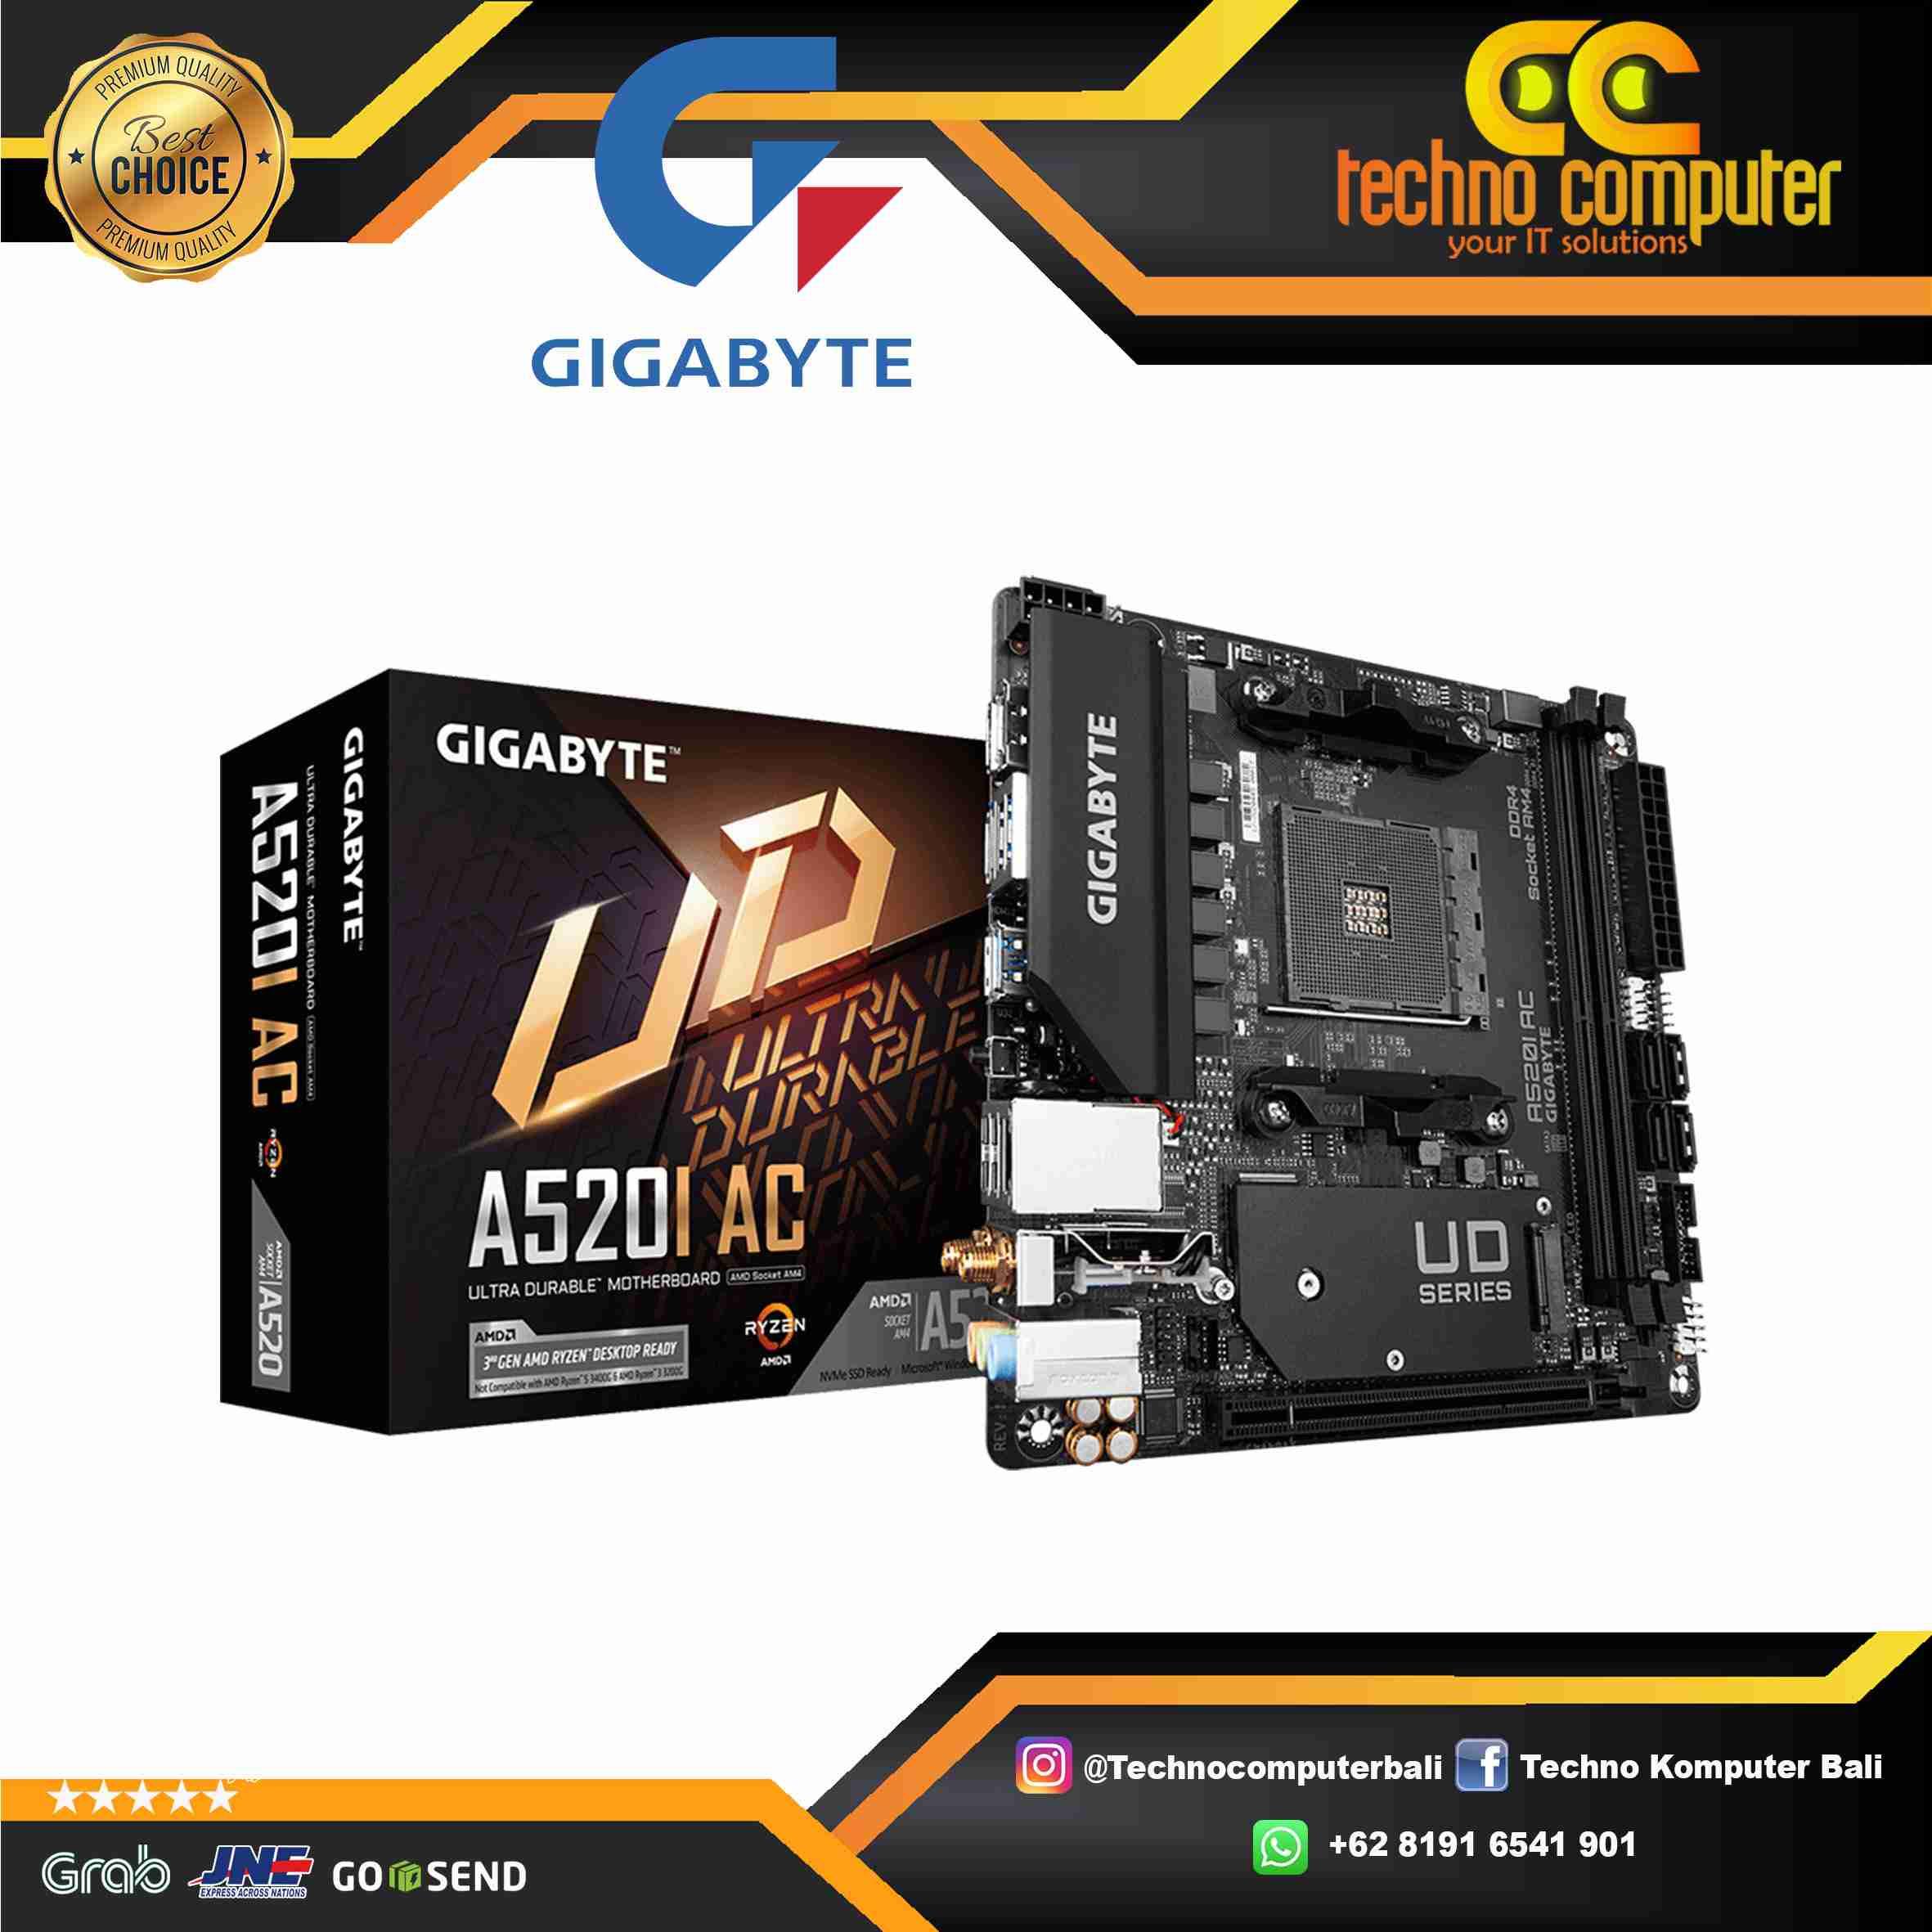 GIGABYTE A520i AC Mini-ITX WIFI - AMD AM4